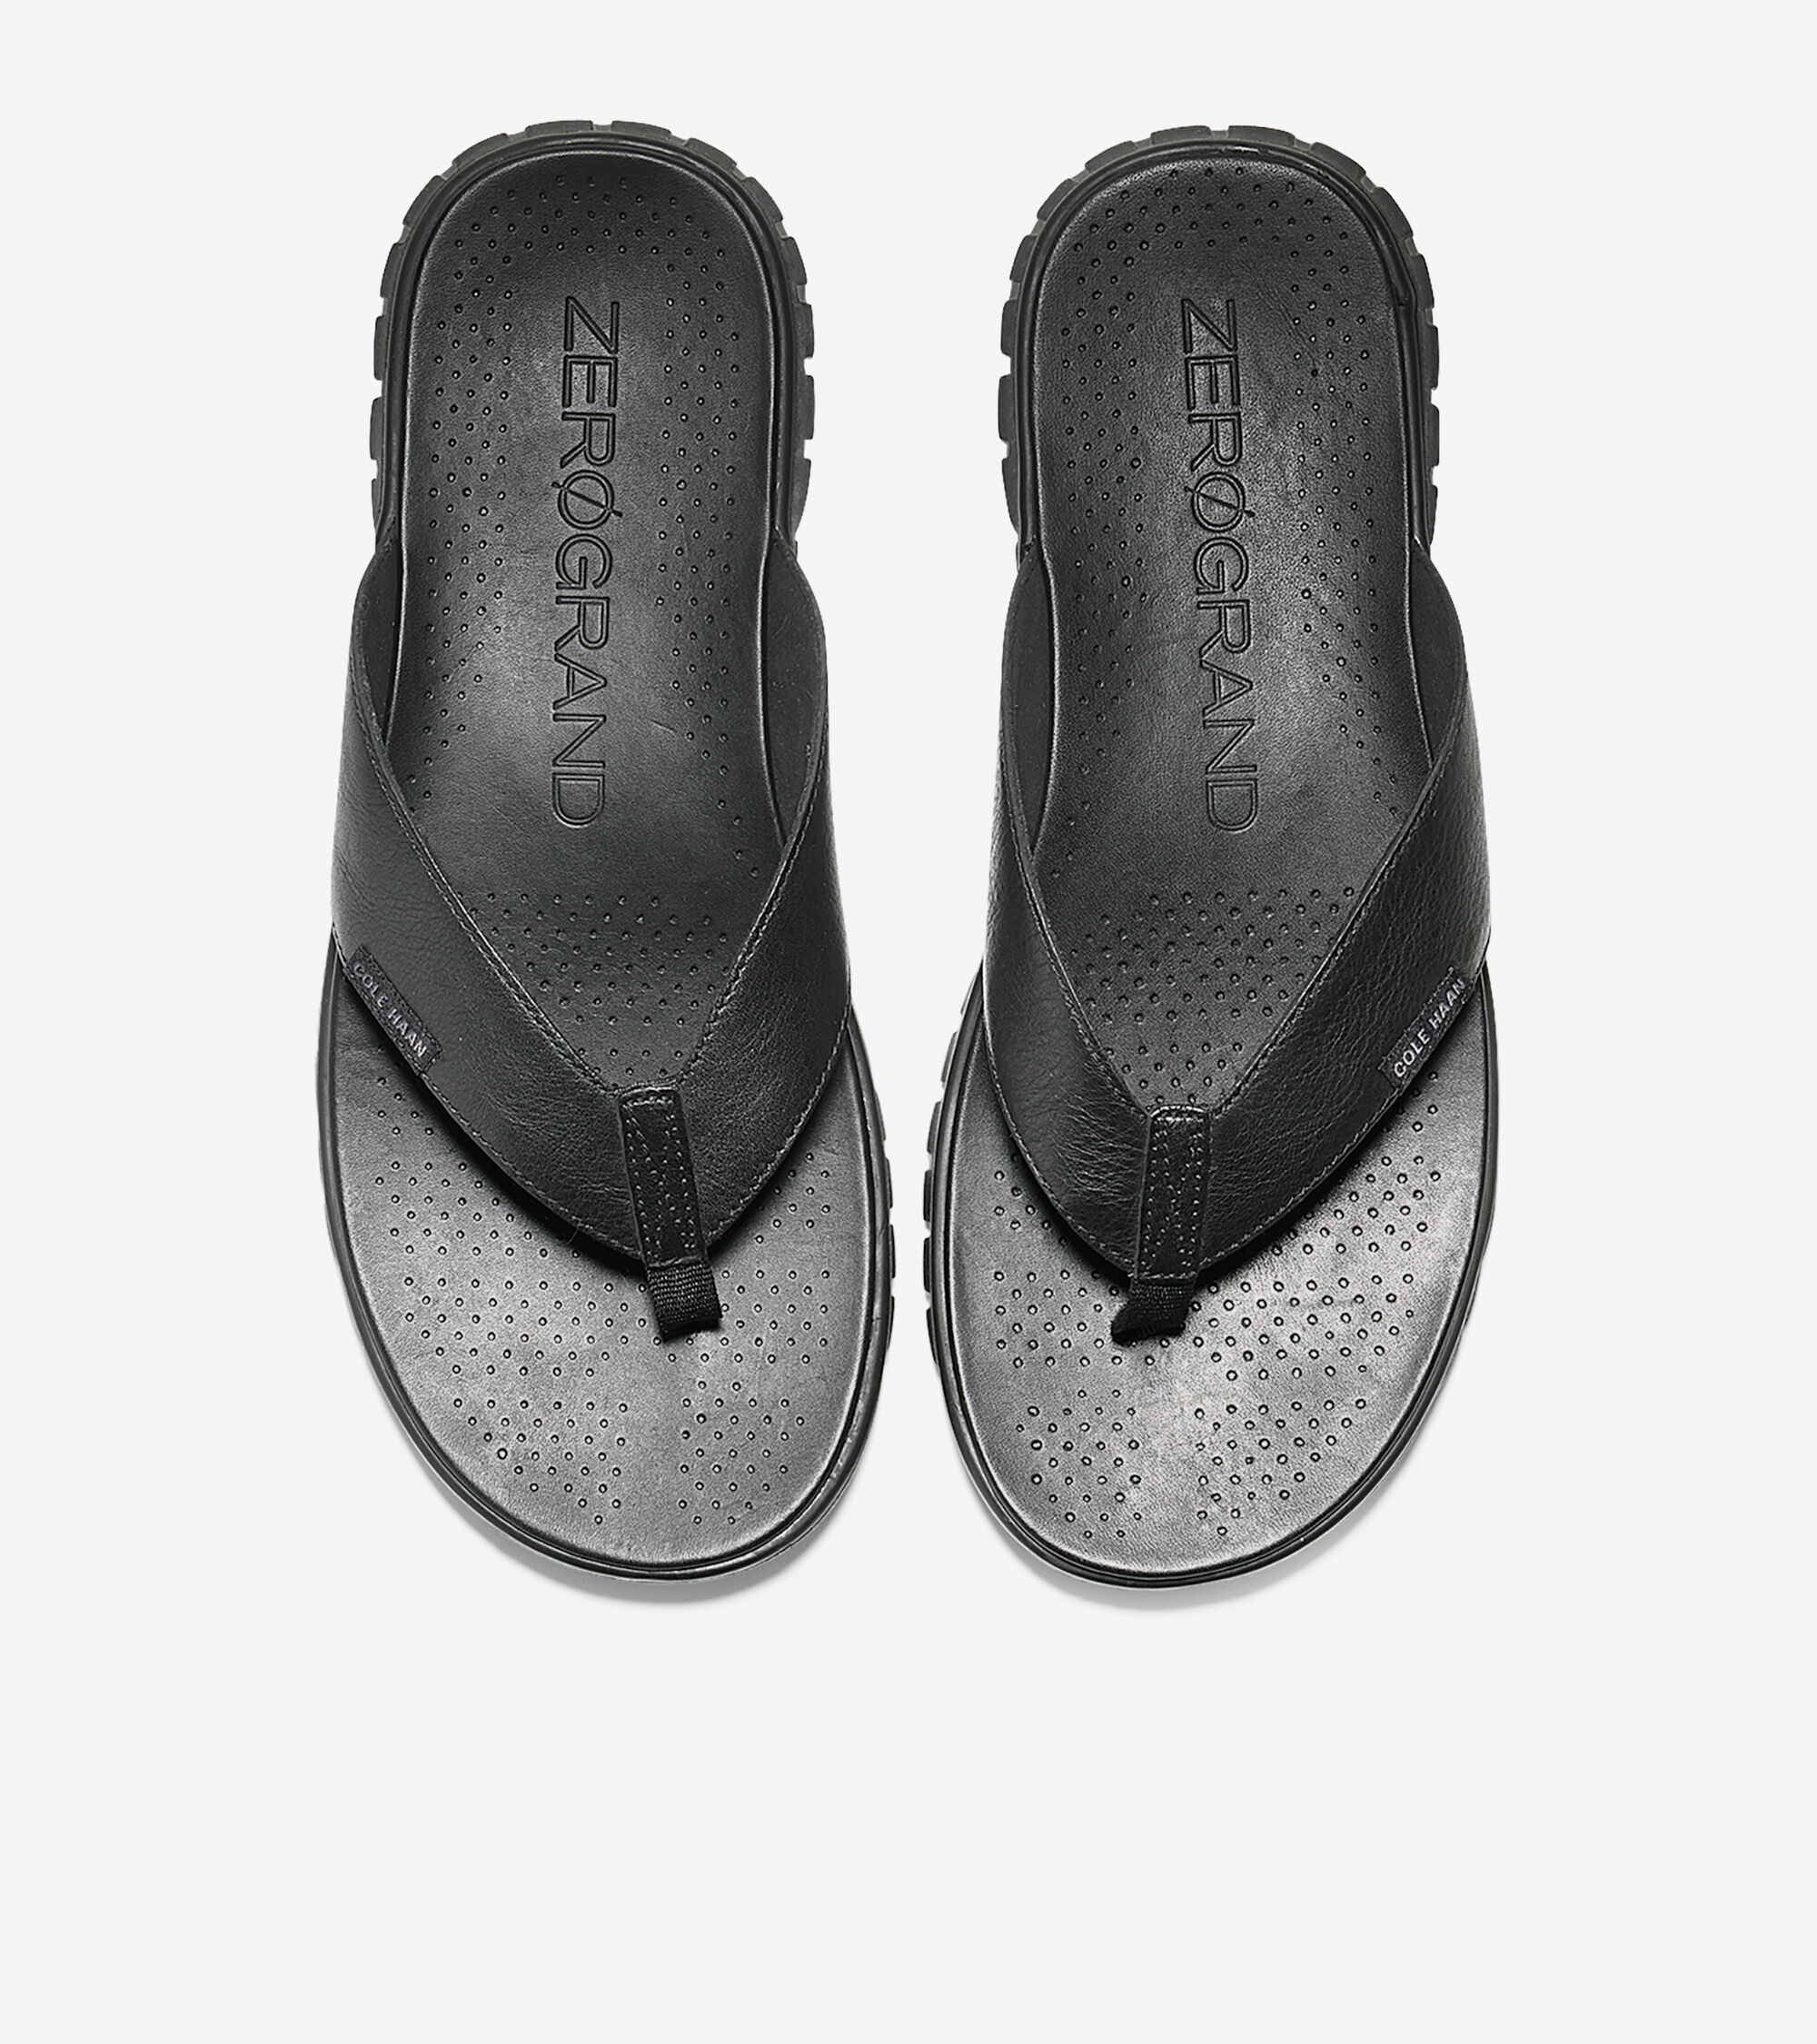 Thong Sandal in Black Leather-black